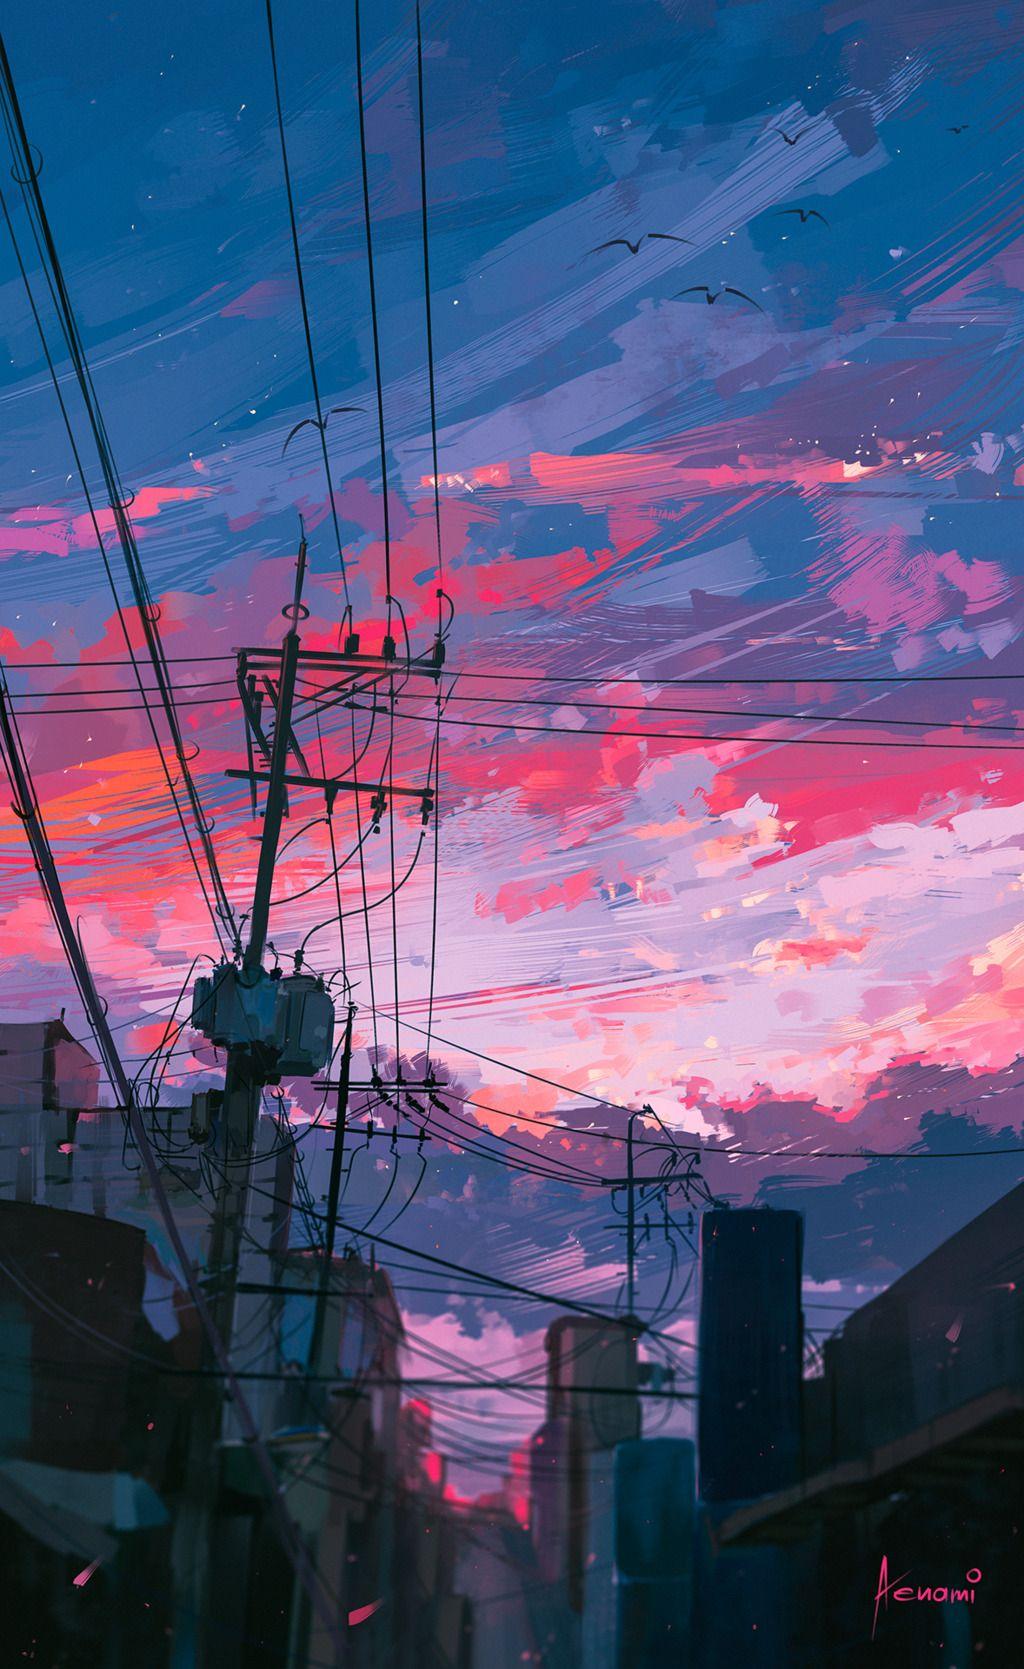 knightofleo Art Anime scenery Aesthetic wallpapers Art 1024x1669